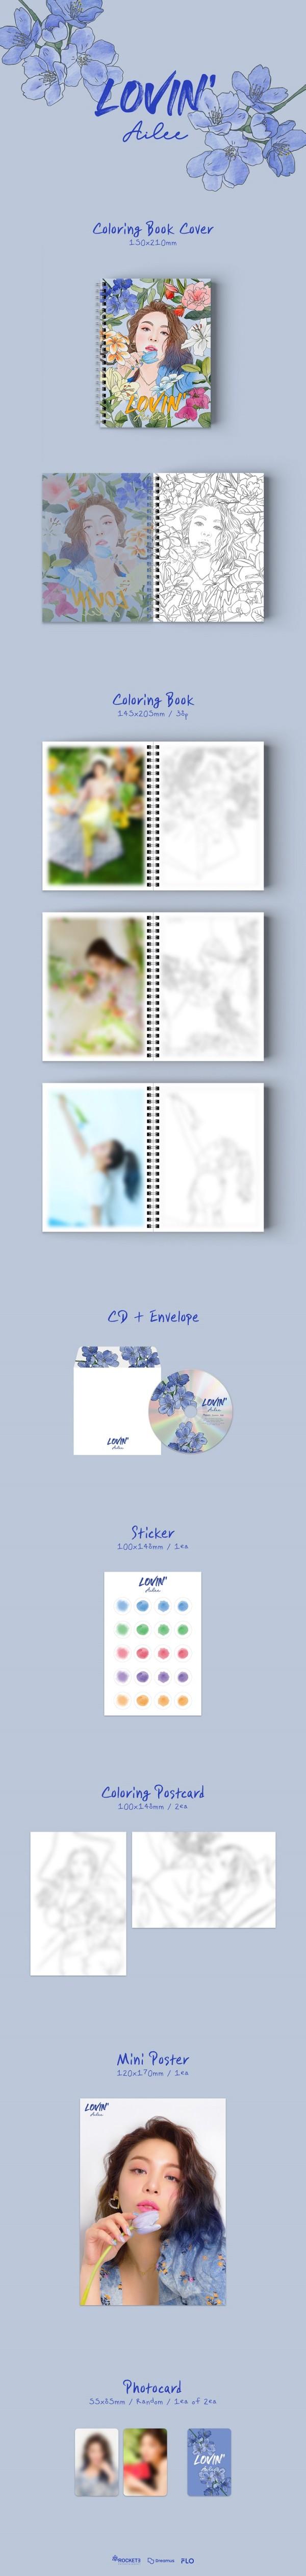 Ailee|韓国アルバム『Lovin'』|今ならオンライン限定15%オフ